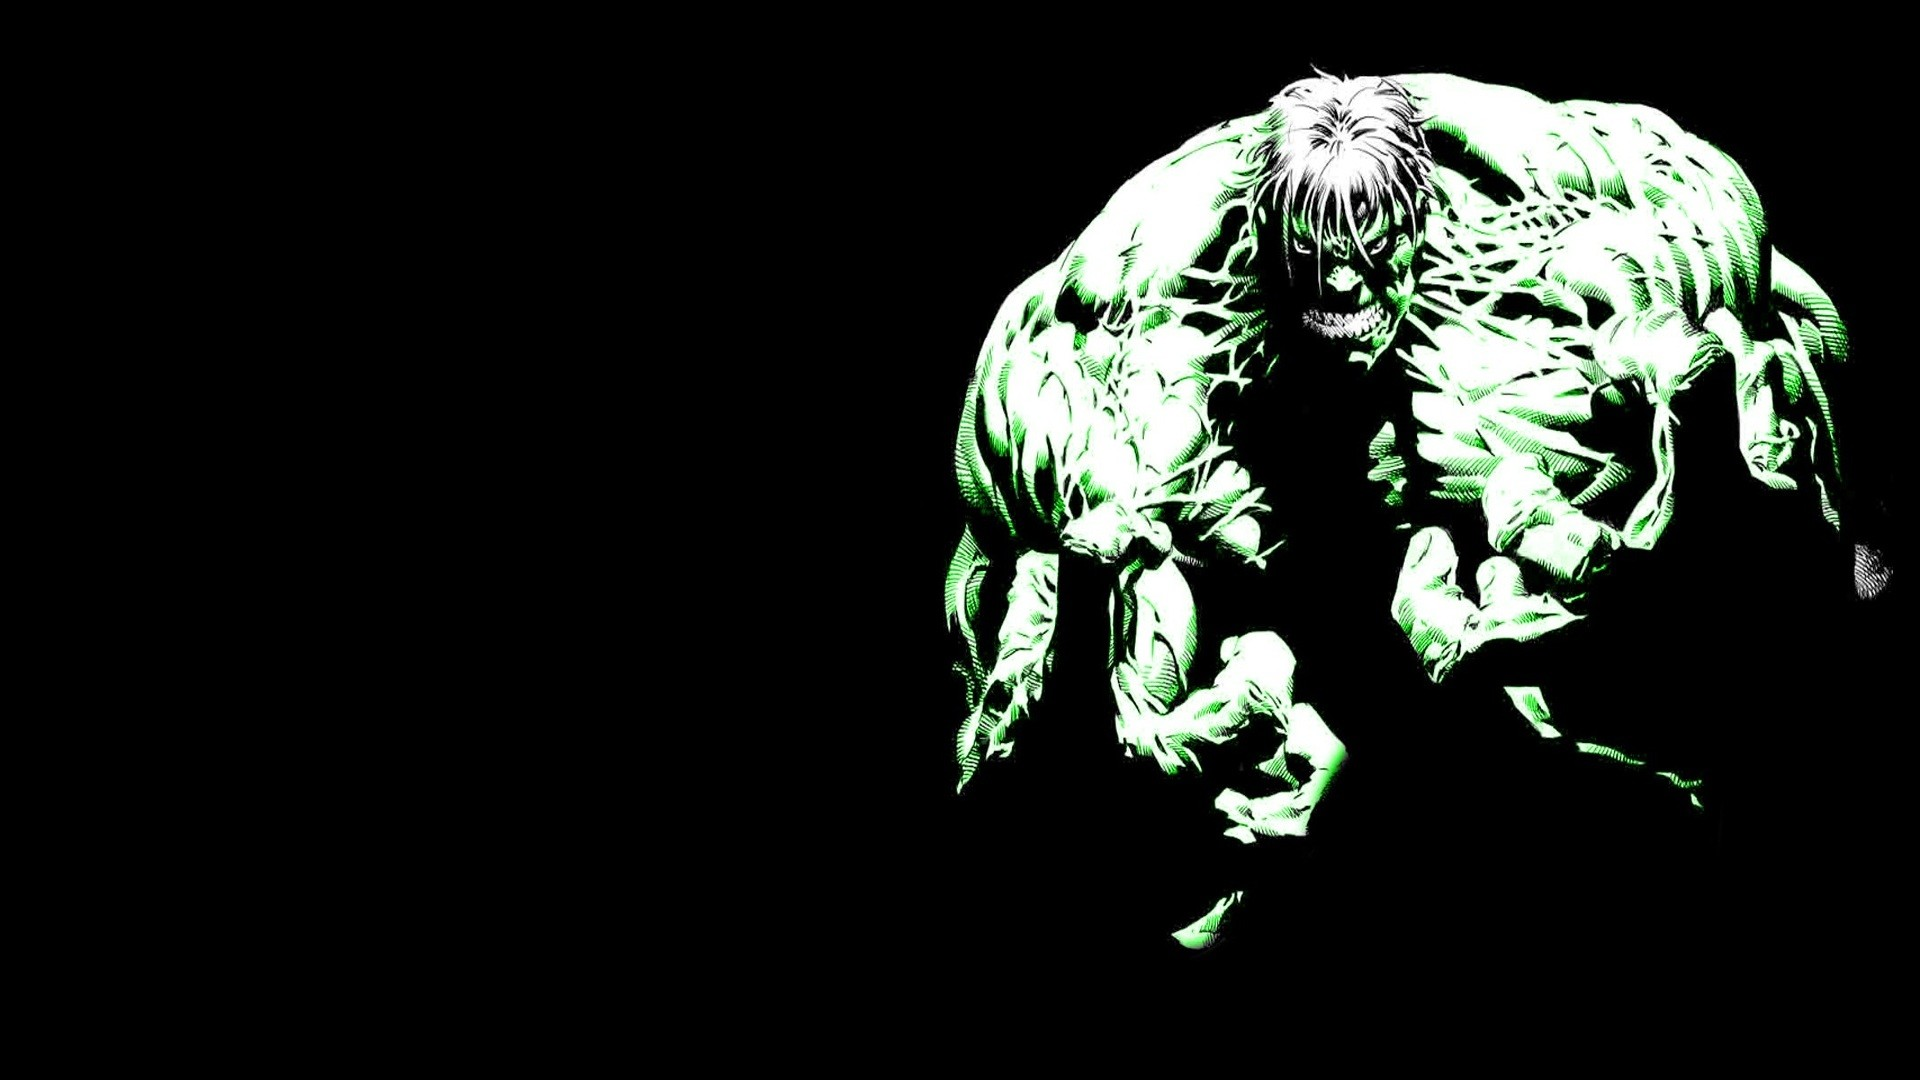 Res: 1920x1080, Hulk Wallpaper 5432